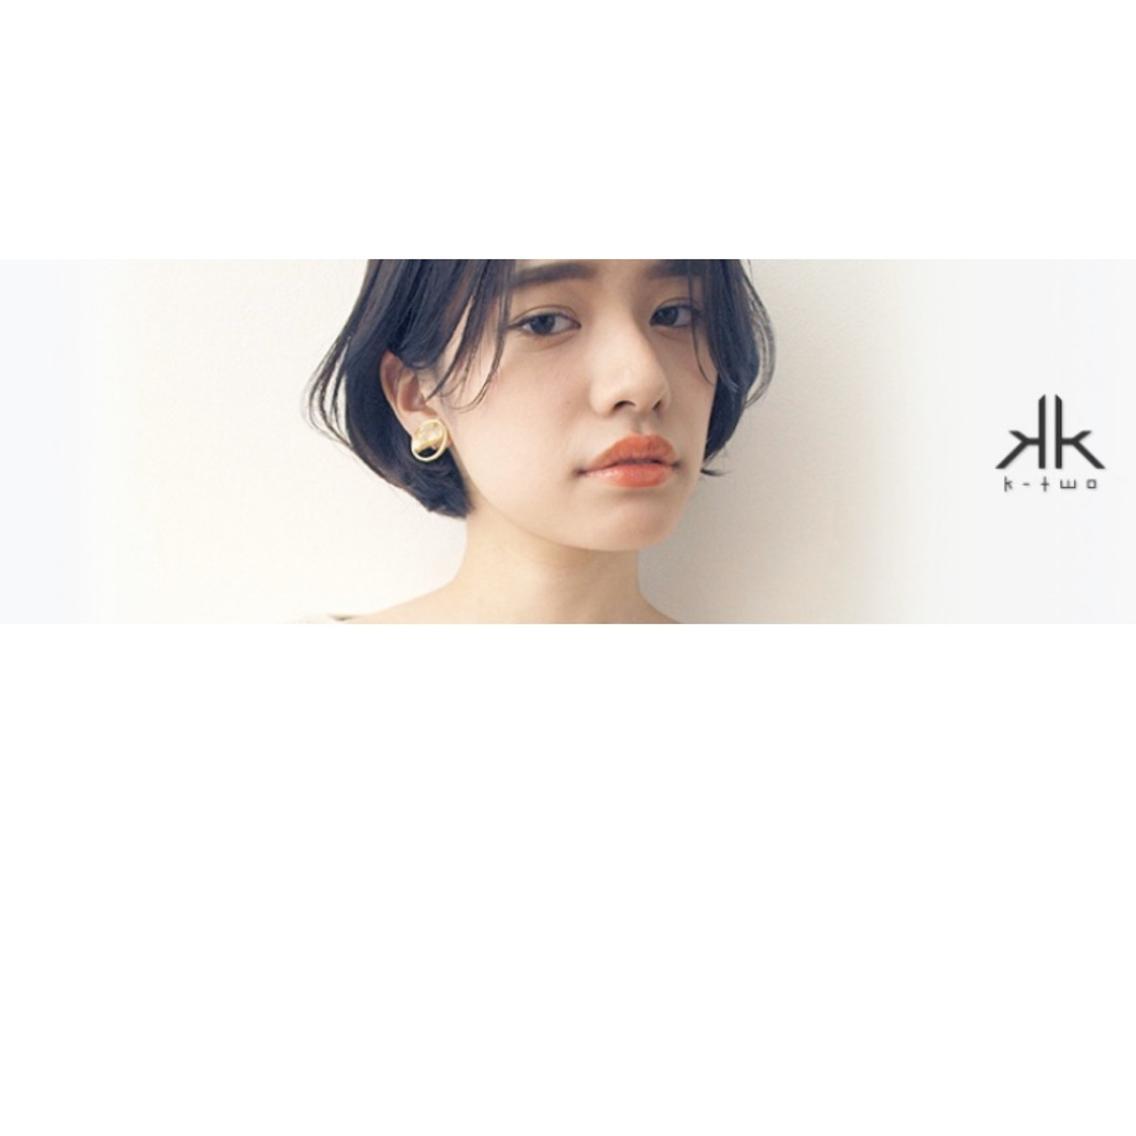 k-two(天王寺)あべのキューズモール店所属・ハイトーンカラー🌈 木下奈々の掲載